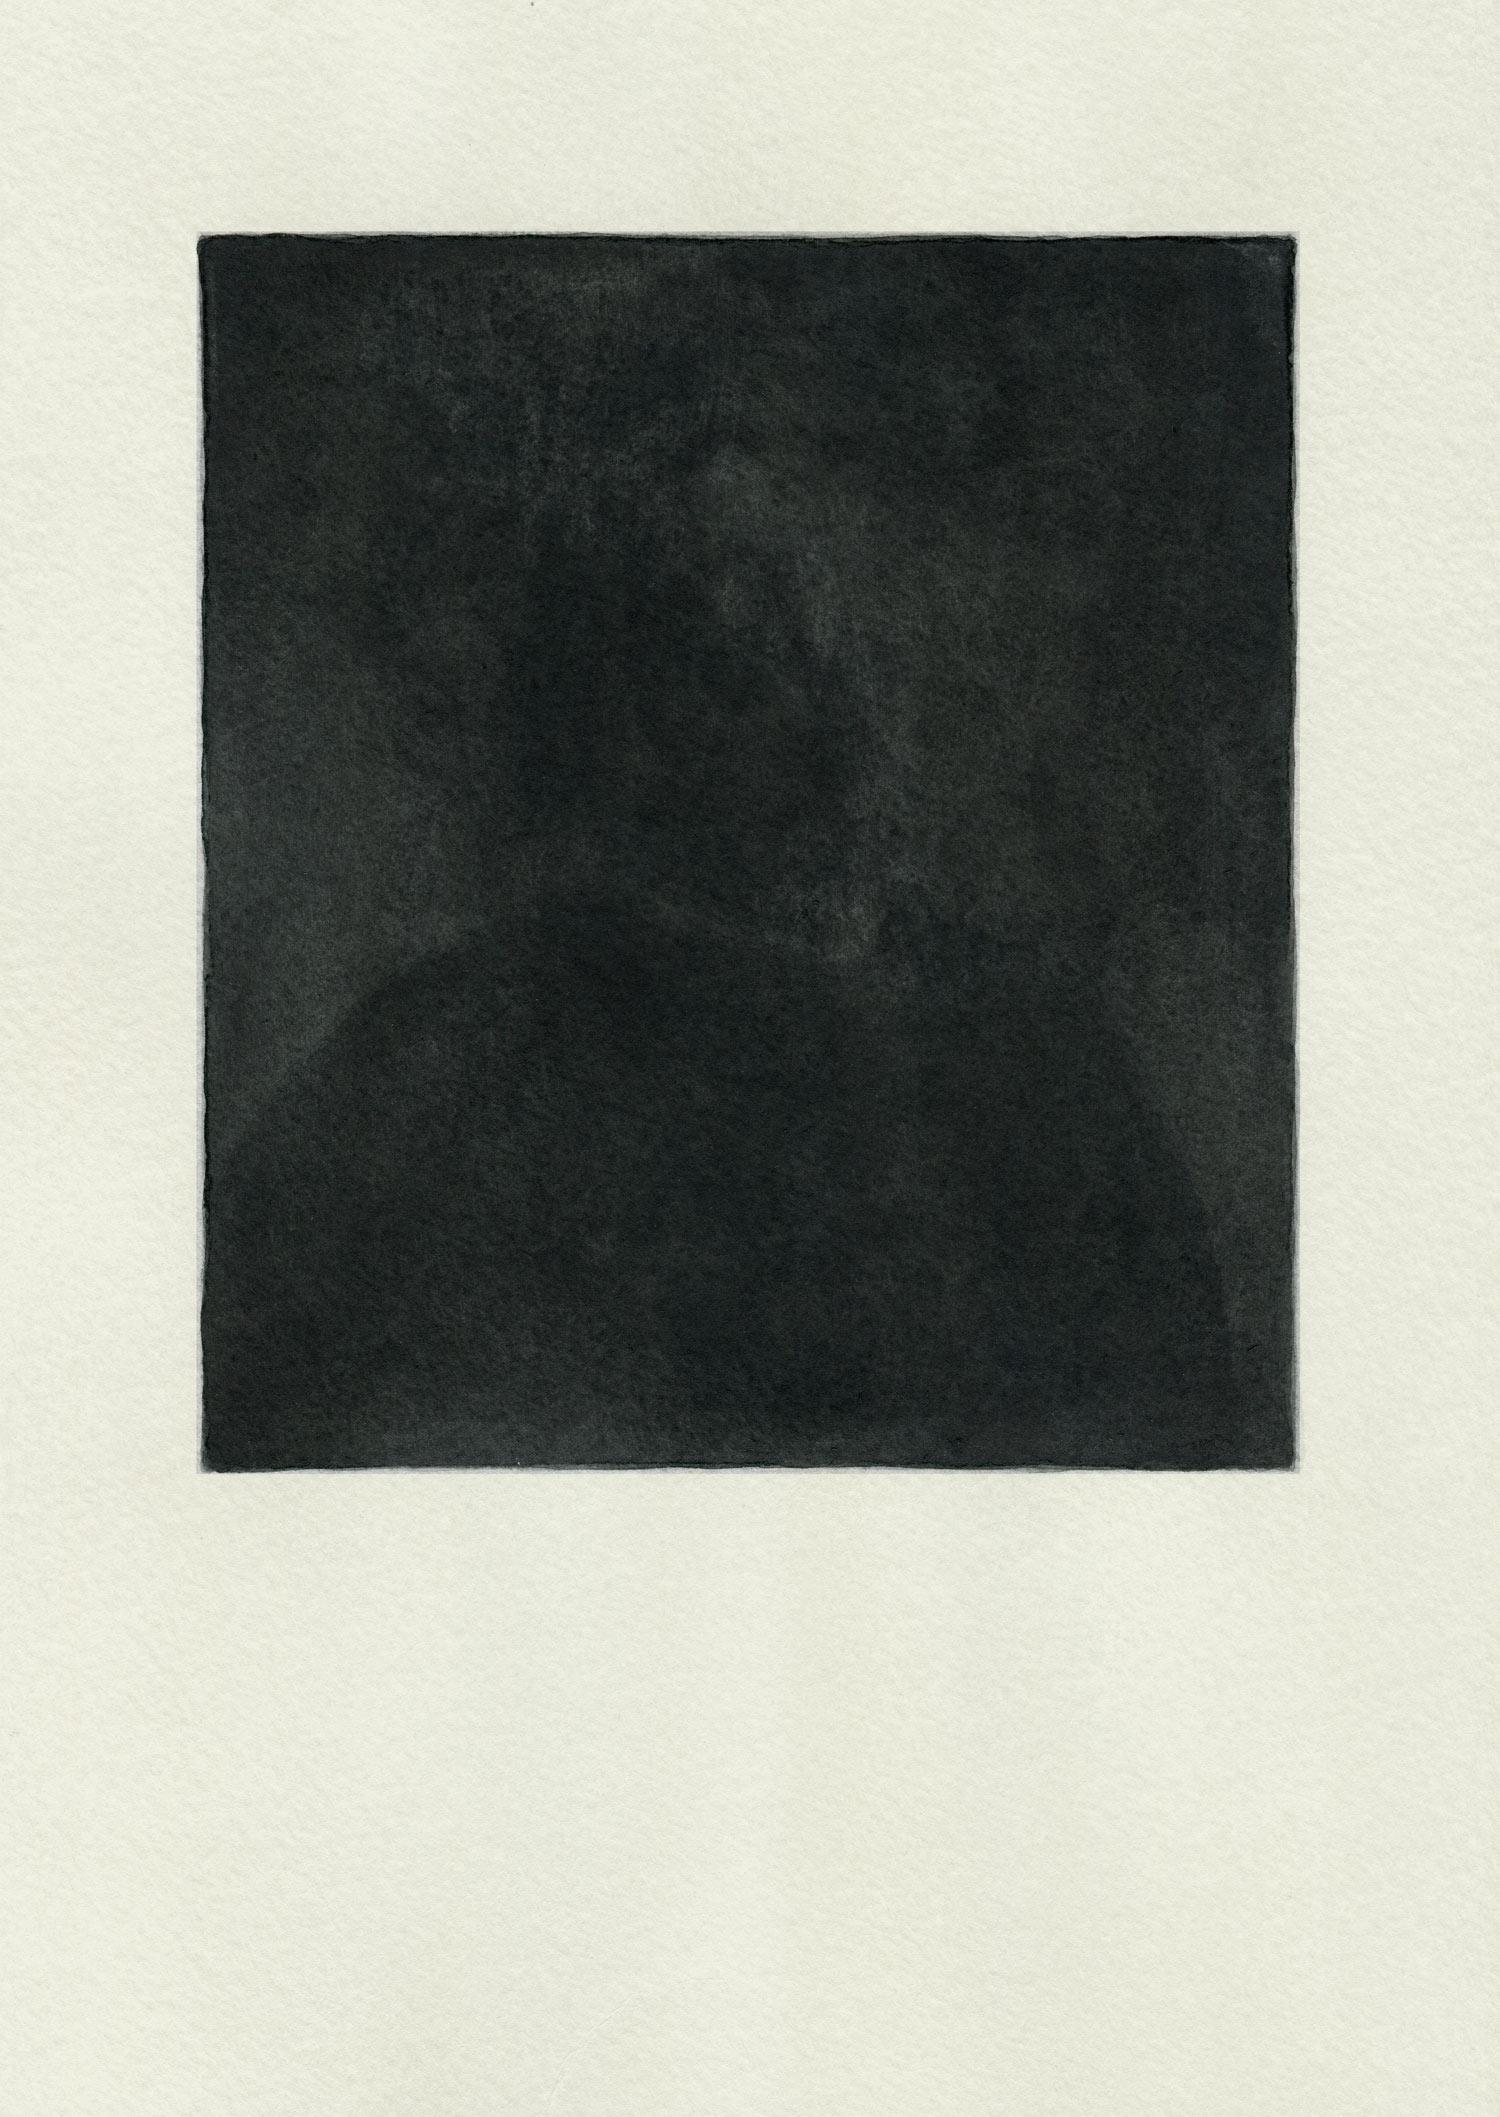 La mirada fantasma: Alonso Cano, 1660. 2016